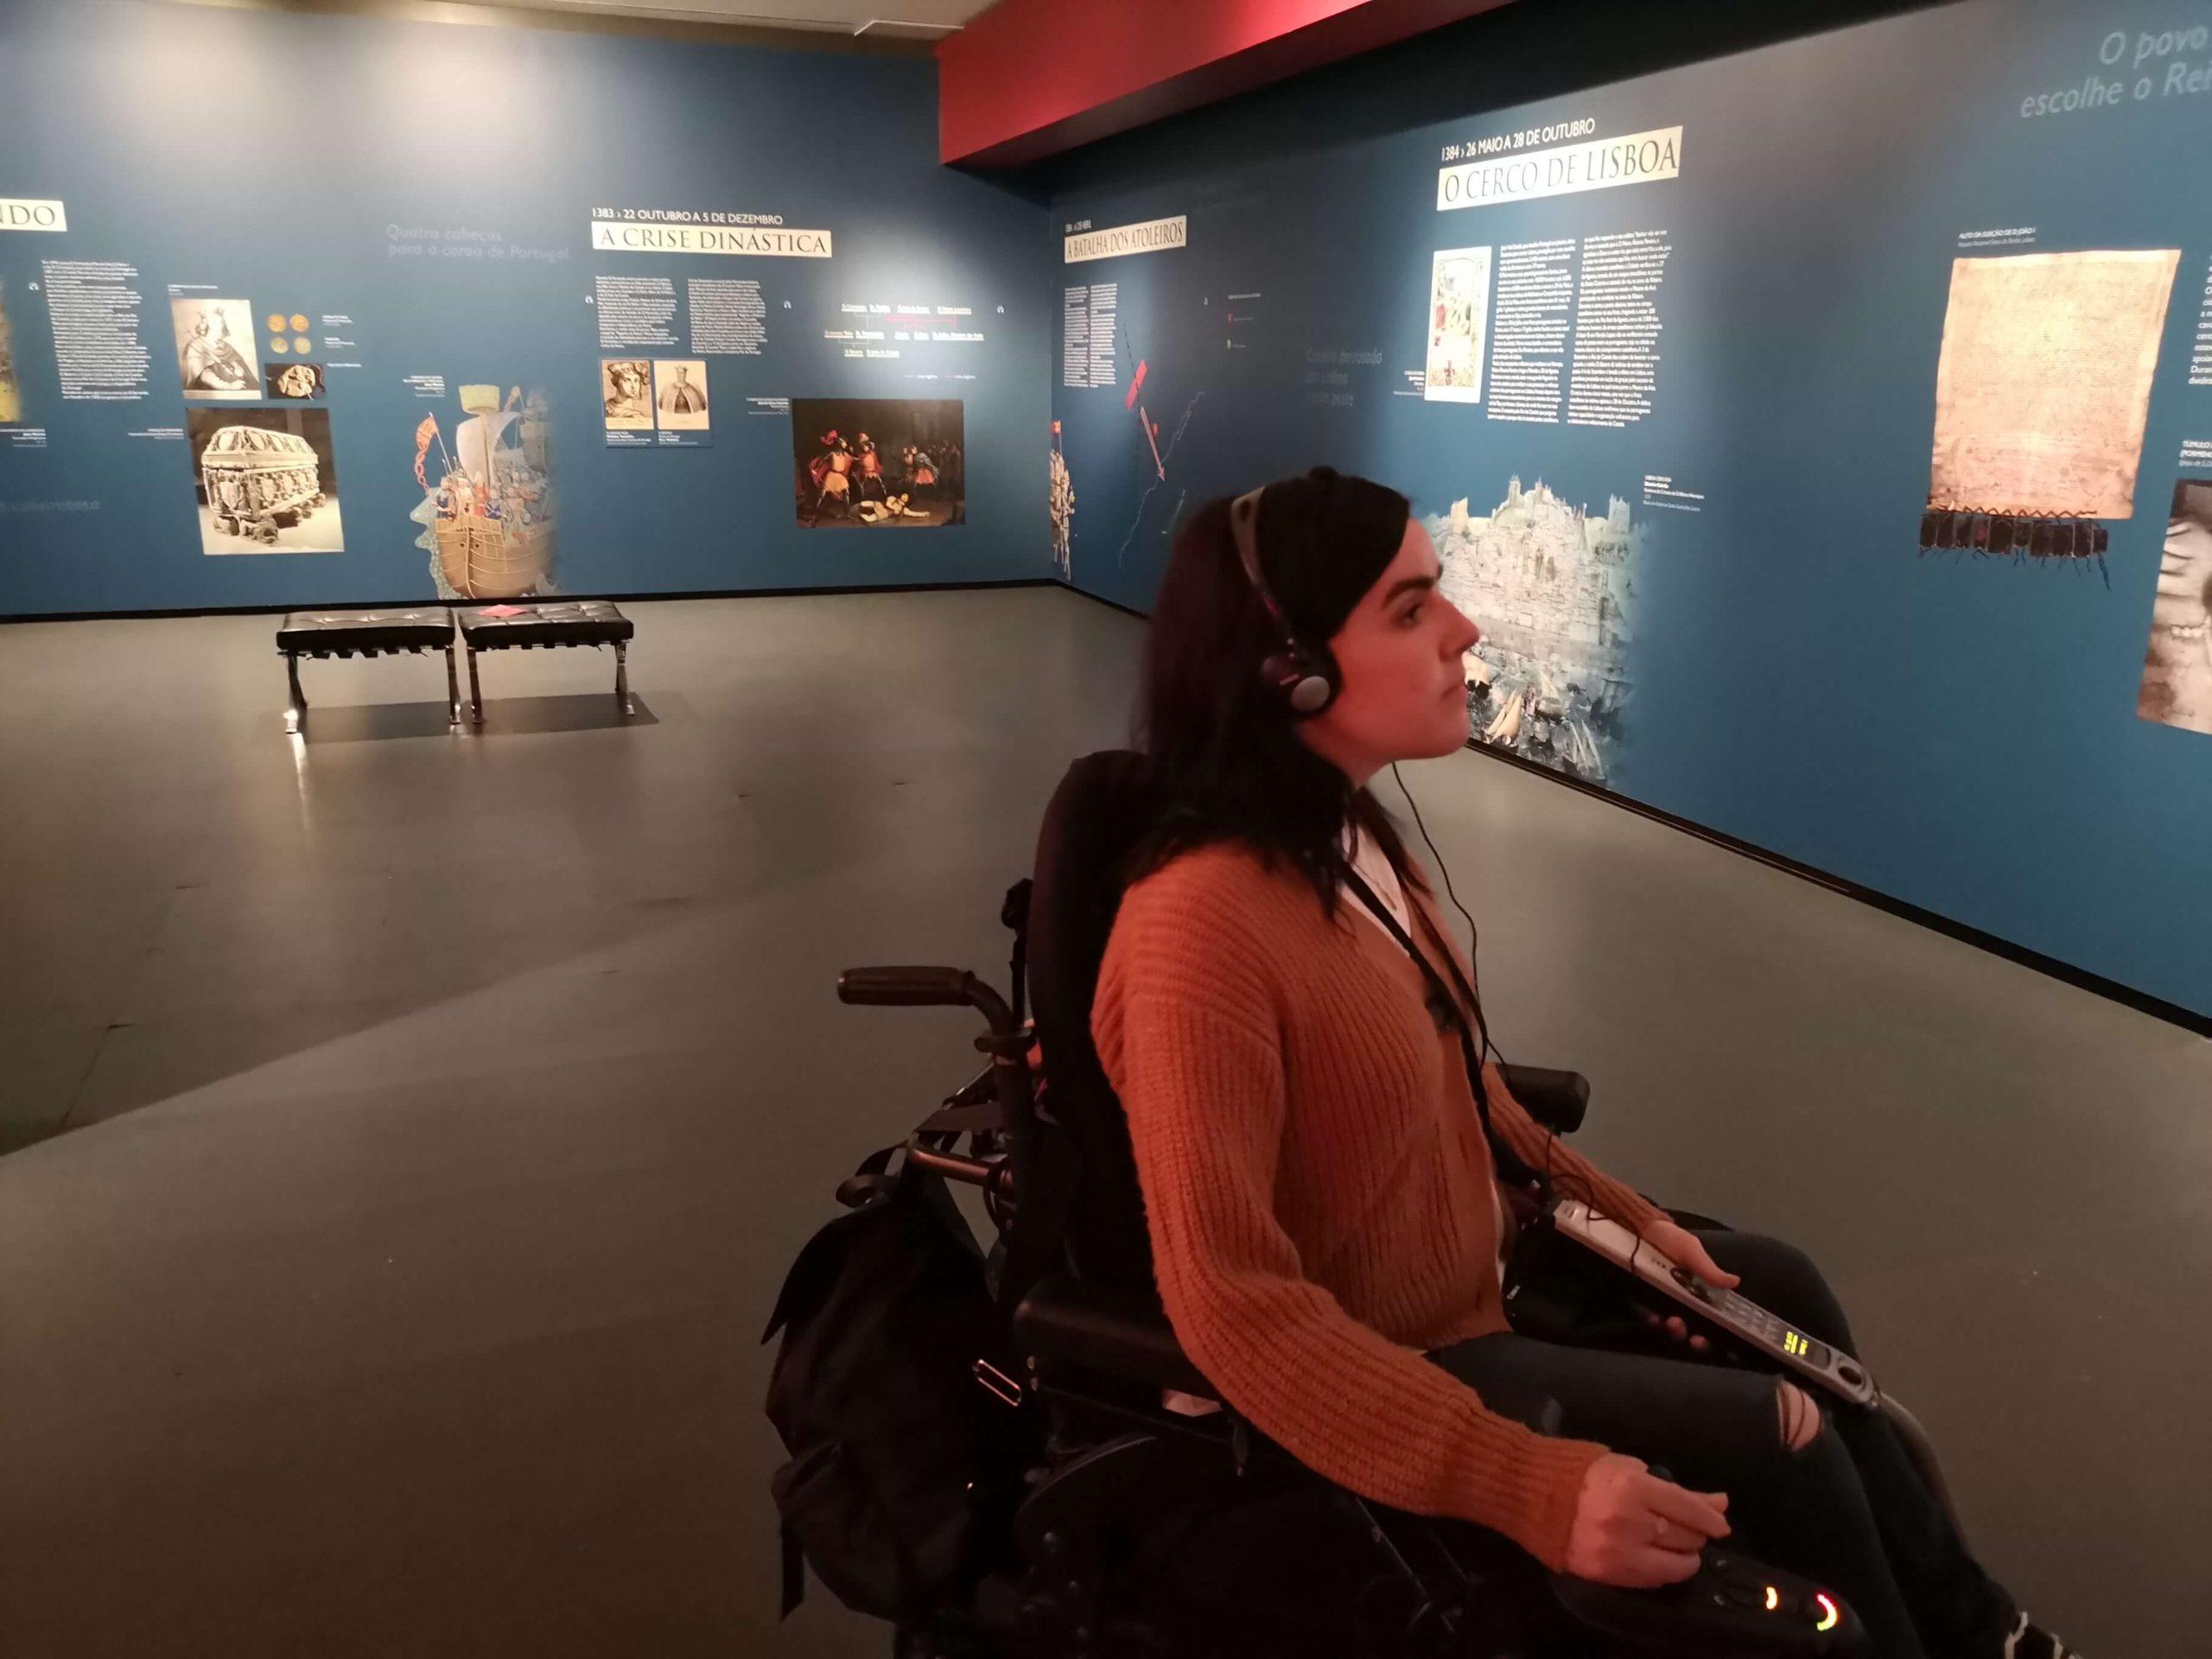 Emma wearing an audio headset listening to the history at Interpretation Centre of Aljubarrota Battle